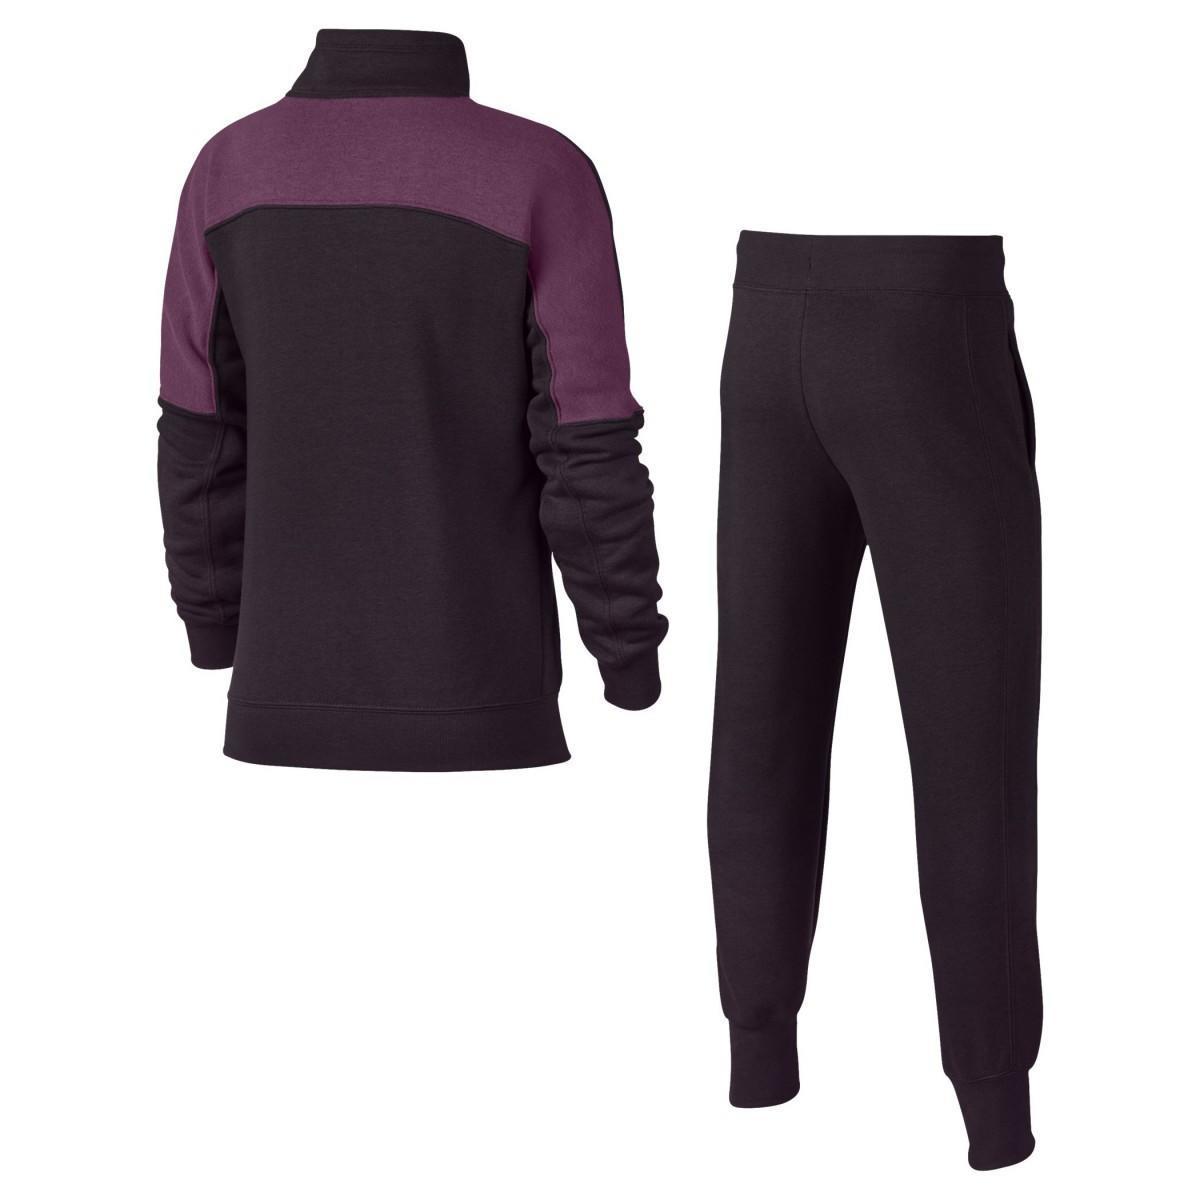 Спортивный костюм детский Nike Girl's NSW Track Suit Port Wine/Tea Berry & Sail